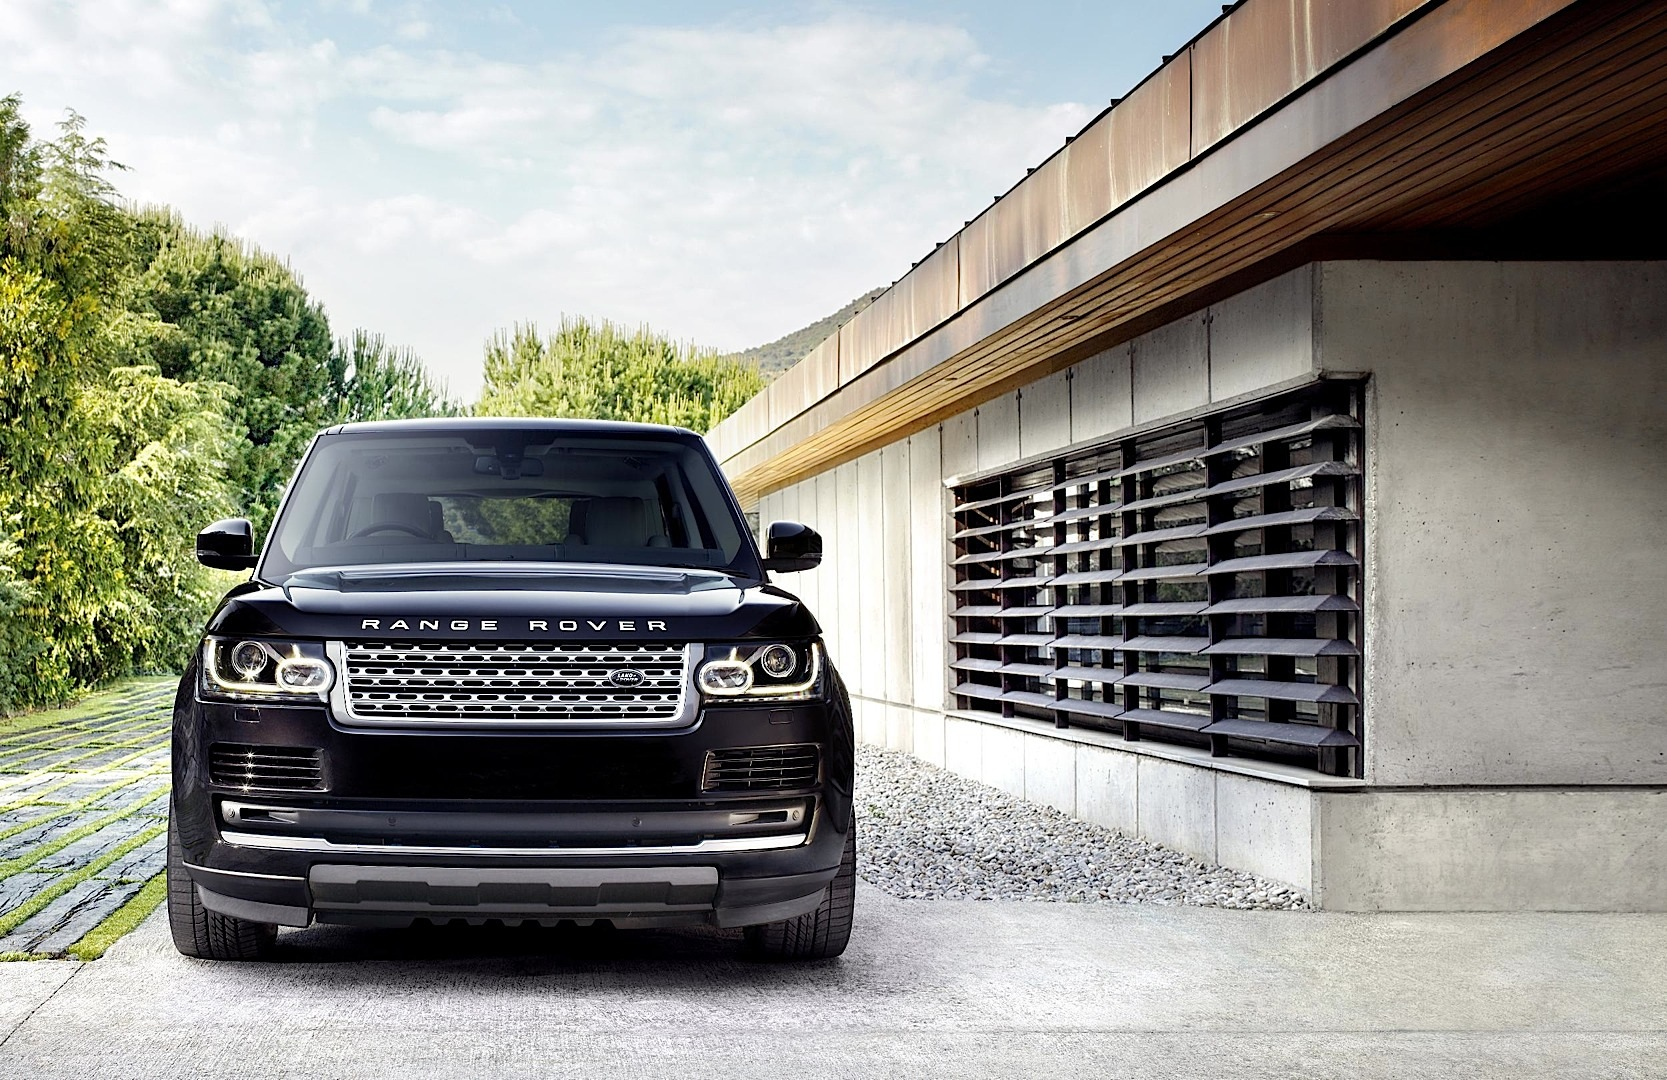 new 2013 range rover uk pricing released autoevolution. Black Bedroom Furniture Sets. Home Design Ideas